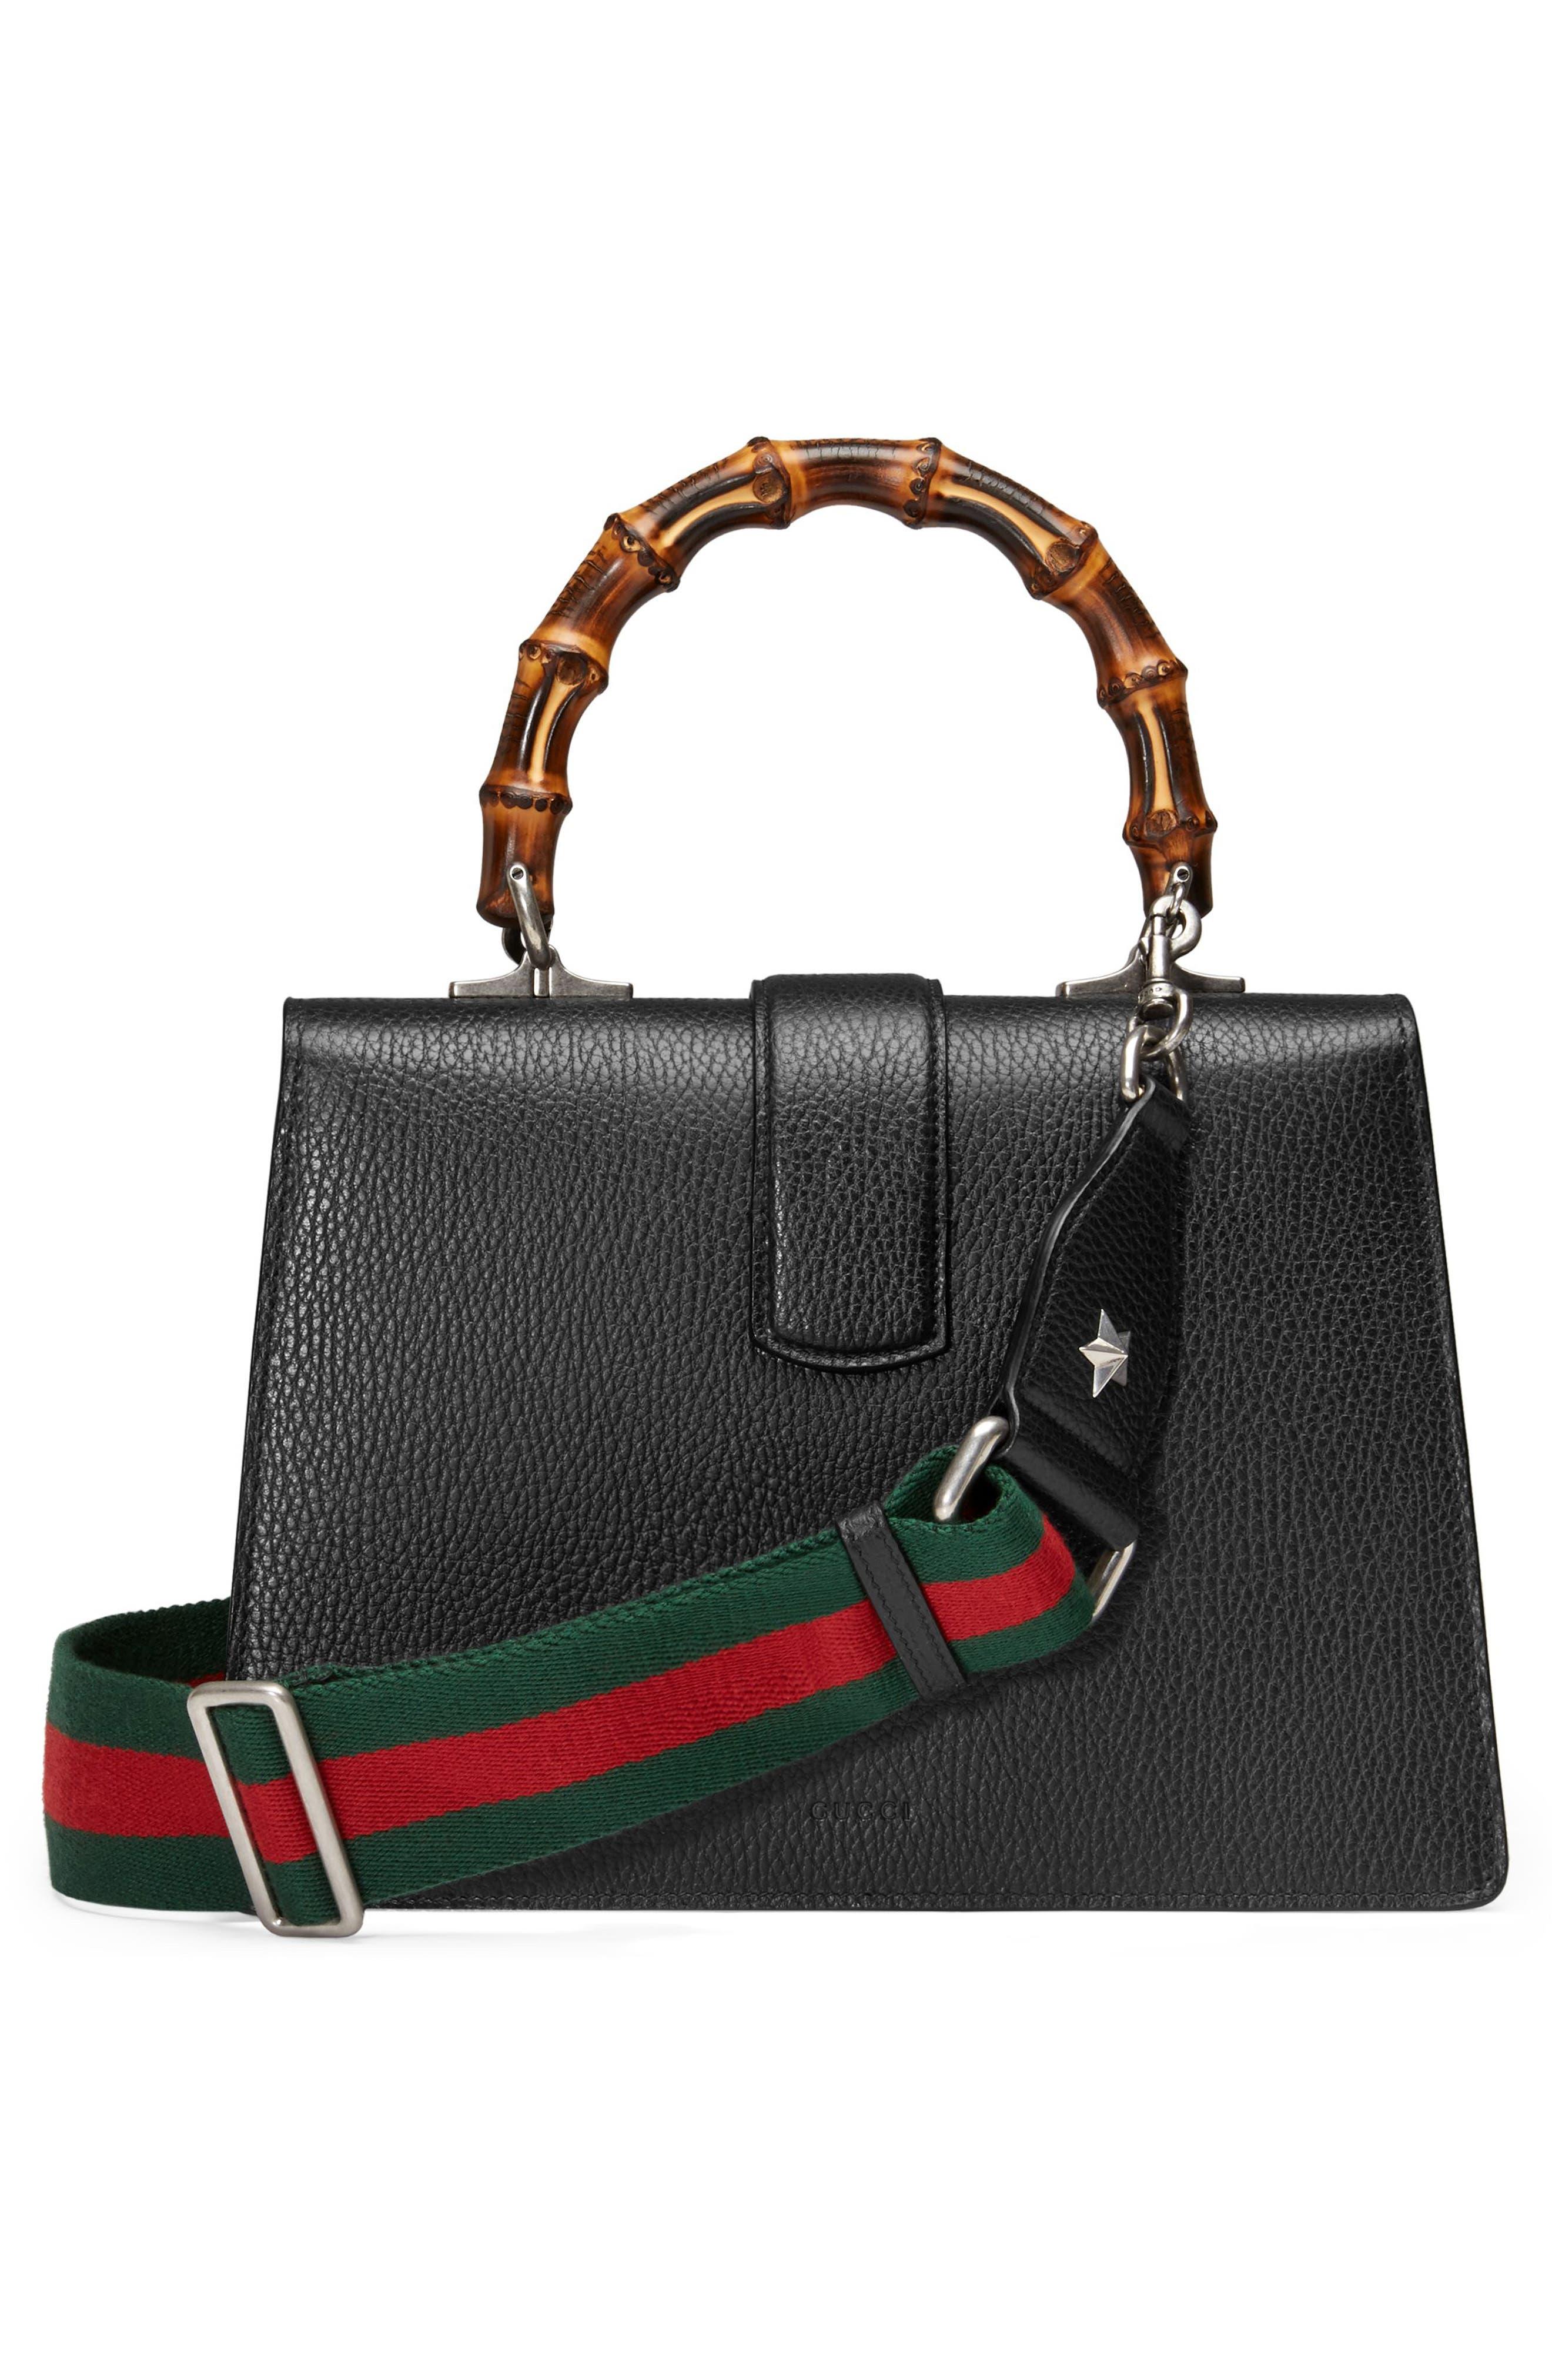 GUCCI, Medium Dionysus Leather Top Handle Satchel, Alternate thumbnail 3, color, NERO/ VRV/ BLACK DIAMOND